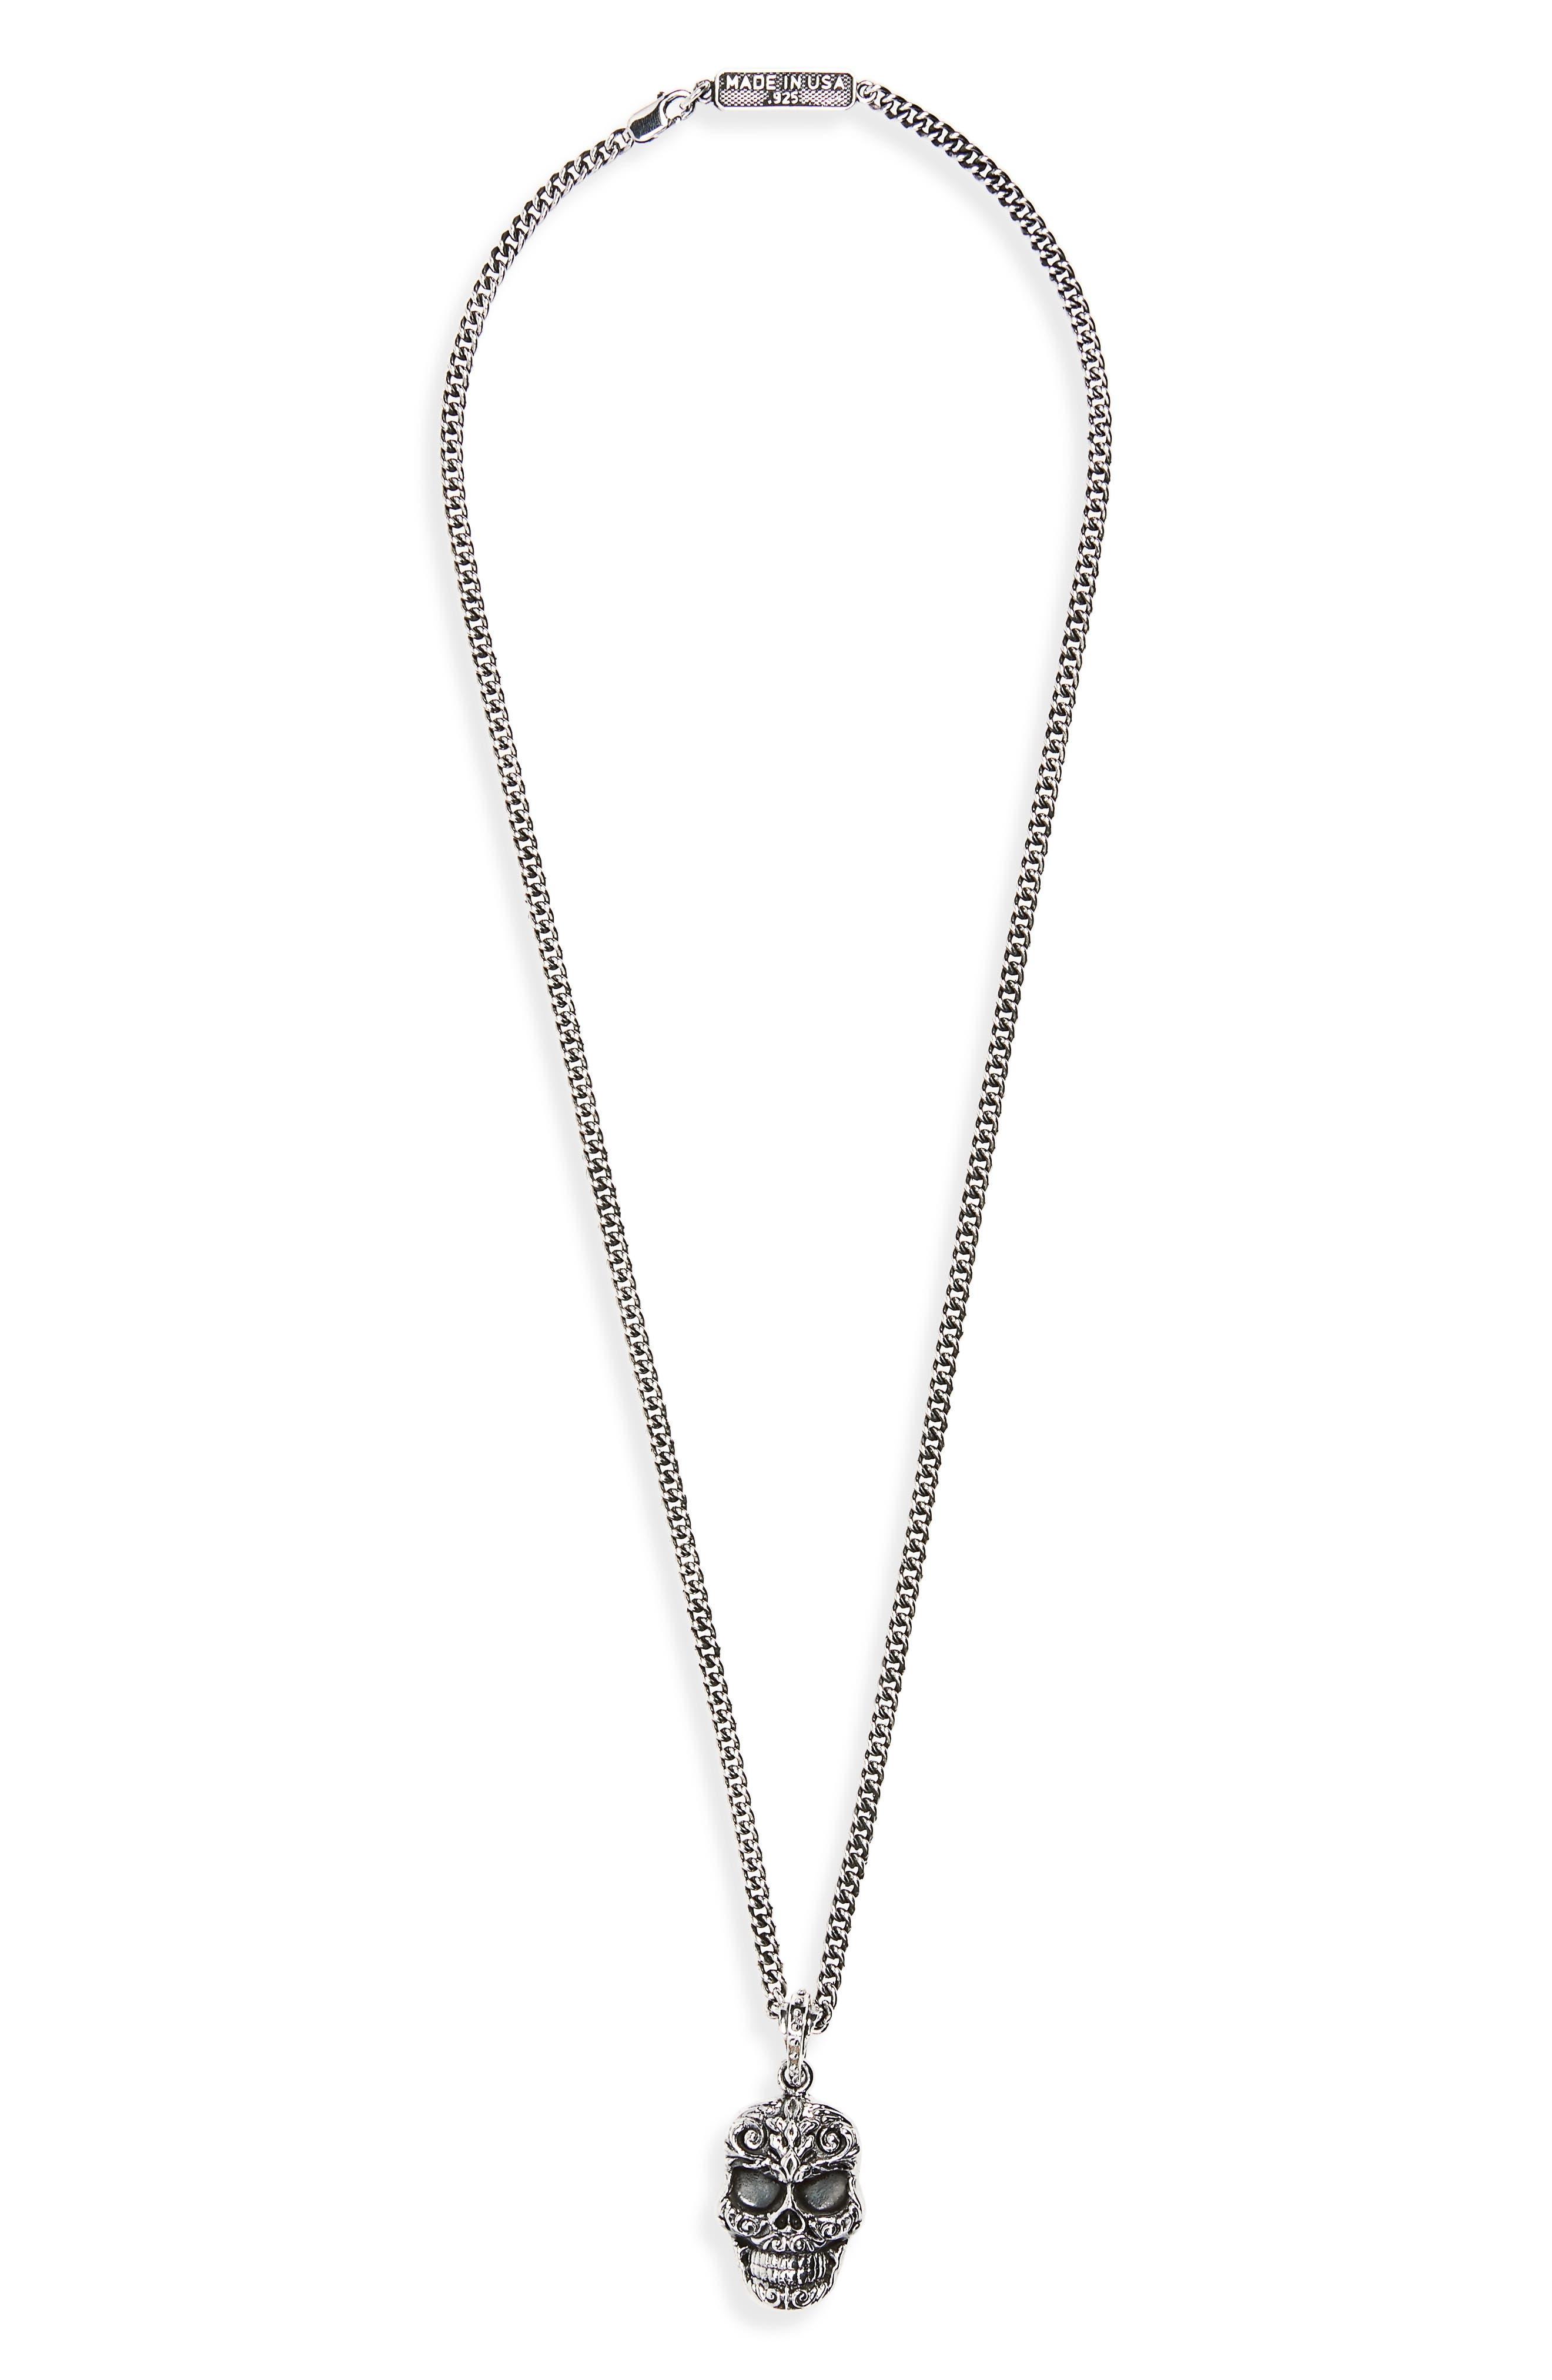 Skull Pendant Necklace,                         Main,                         color, Silver